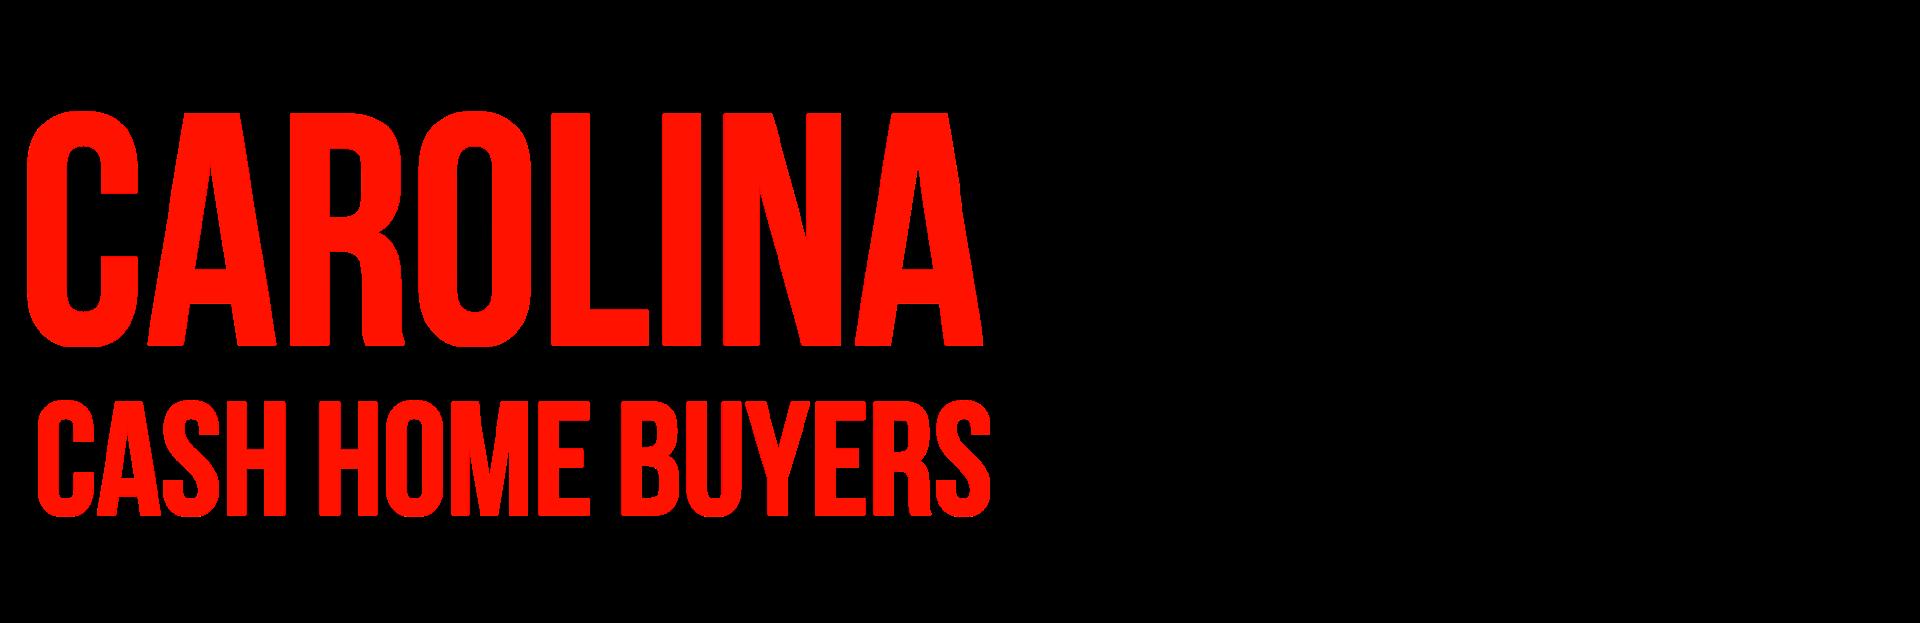 CASH HOME BUYERS CAROLINA logo